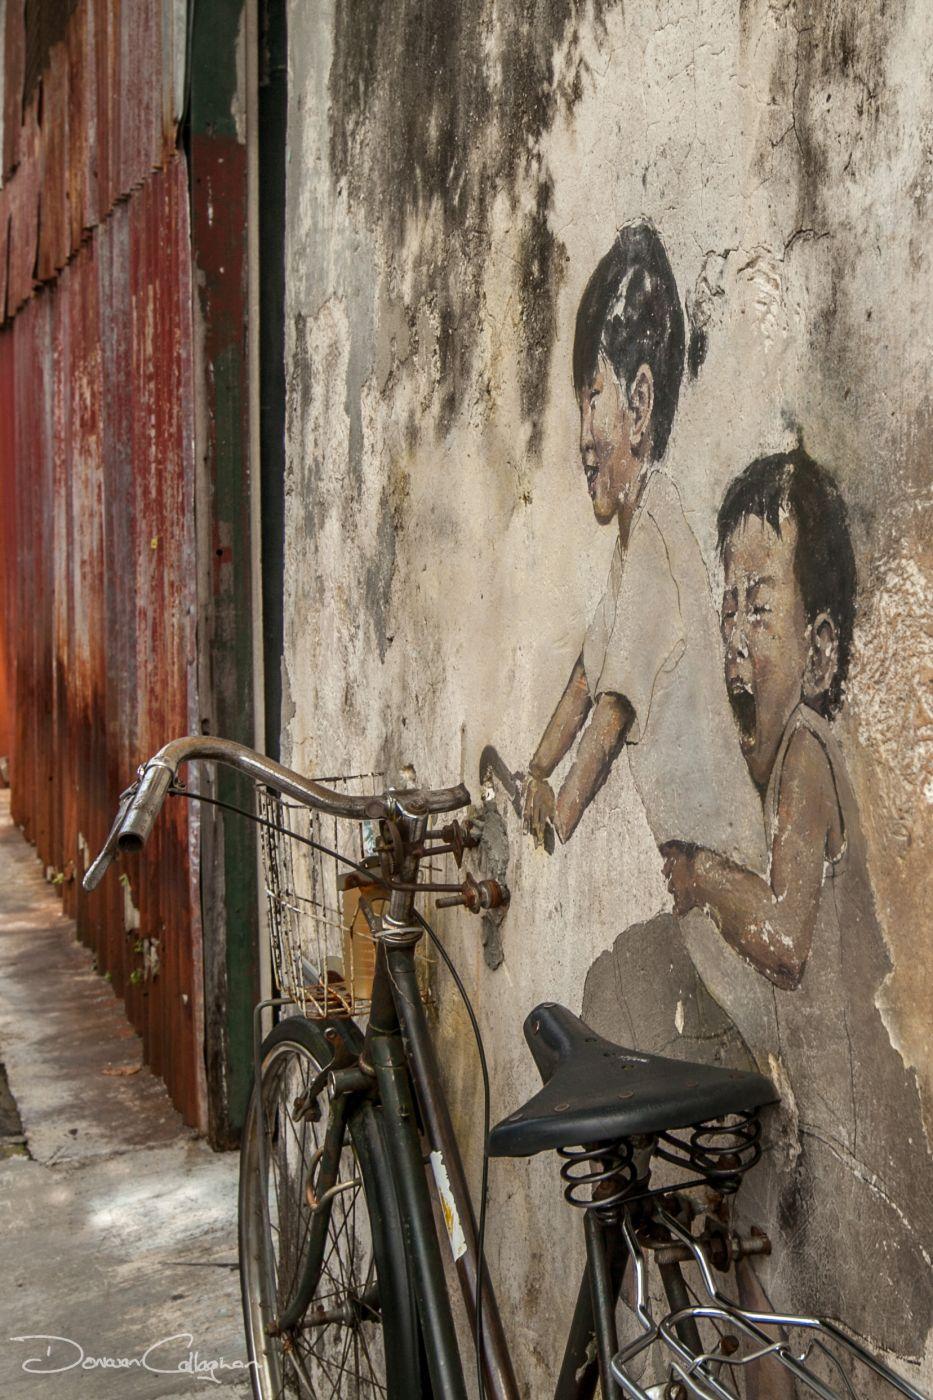 Penang Street art Georgetown 2 on bike, Malaysia